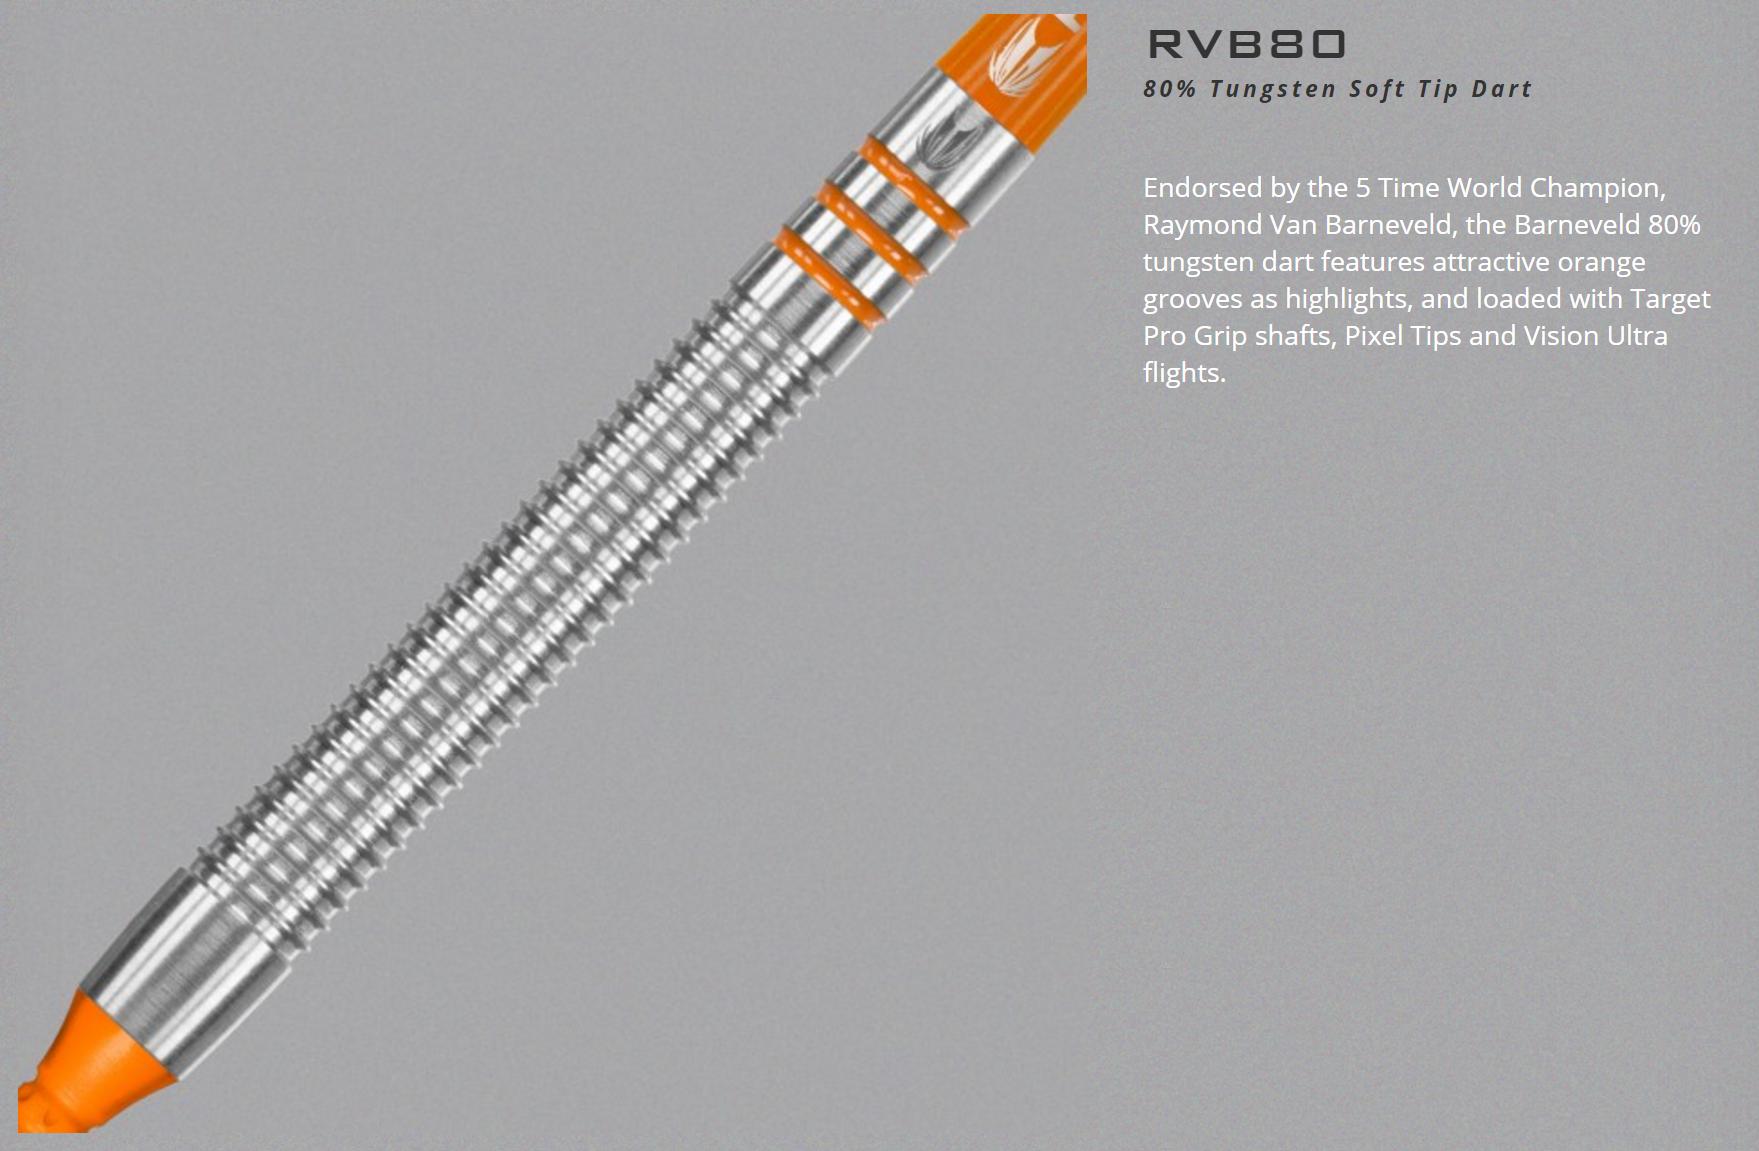 rvb80-soft-2.png